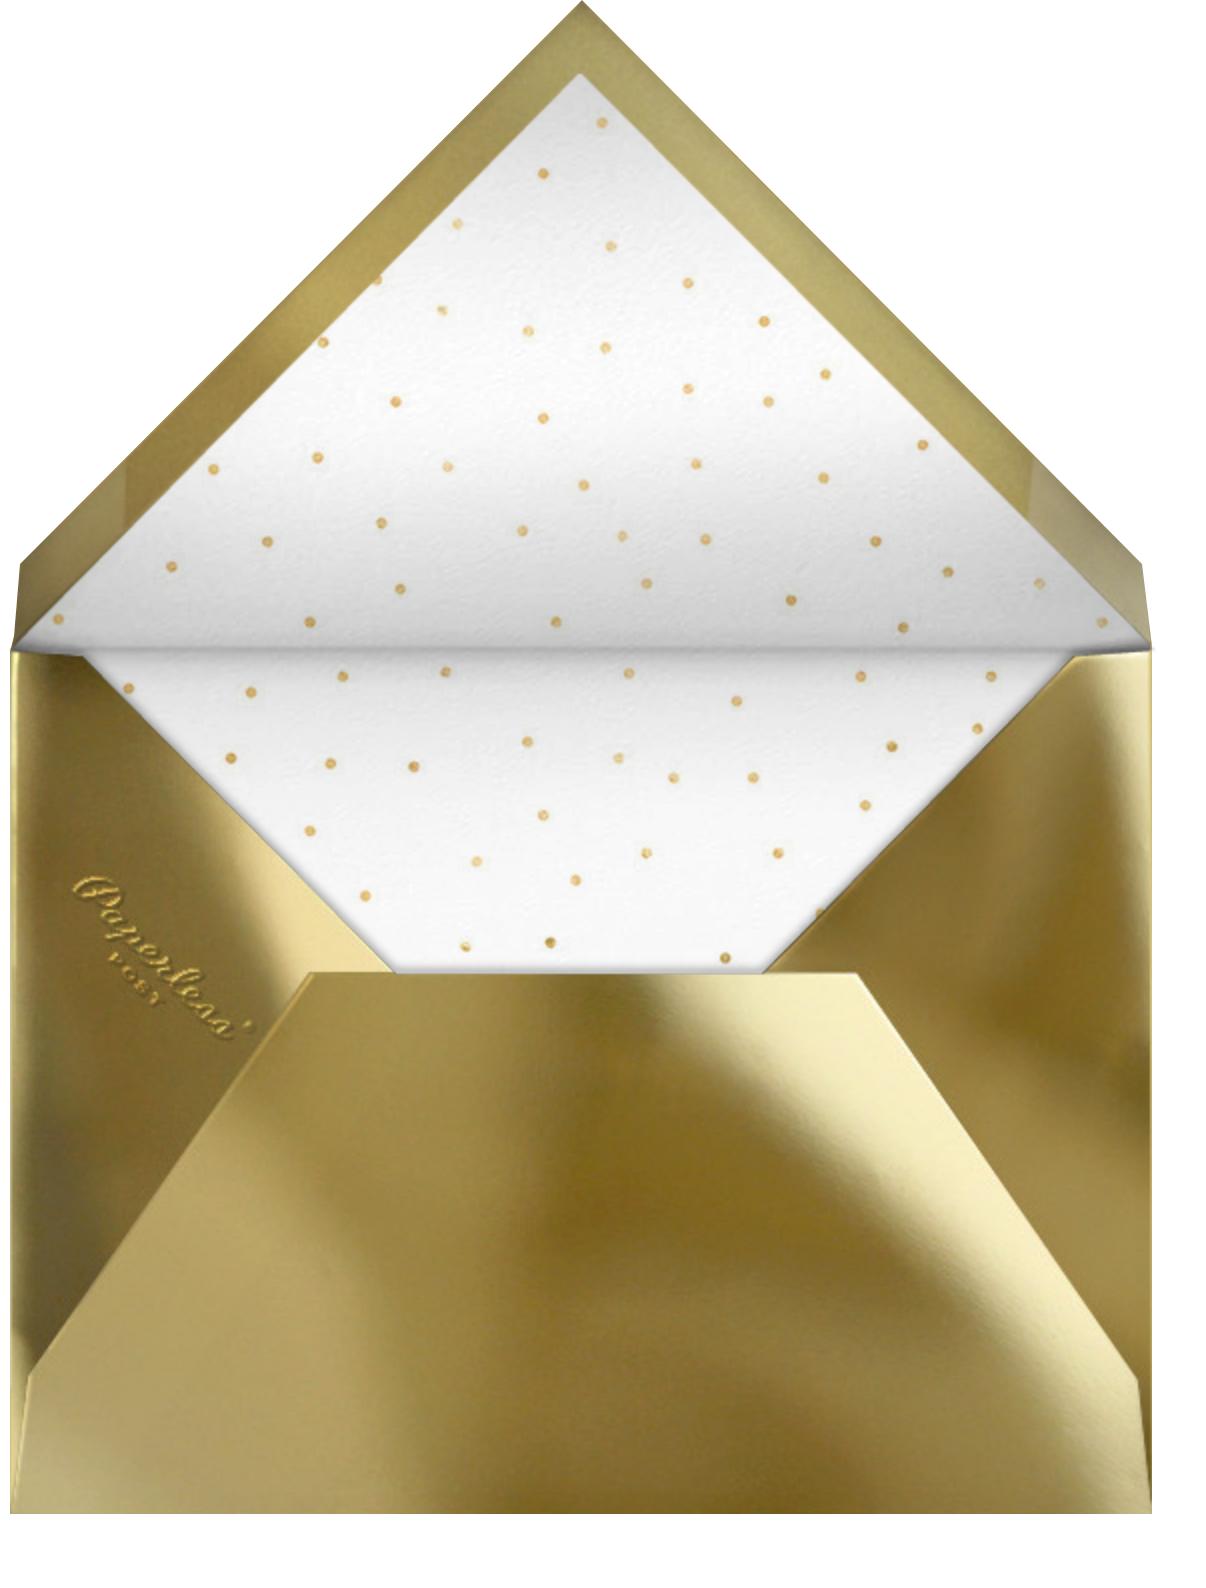 O Tannenbear (Horizontal) - Maracshino - Paperless Post - Winter entertaining - envelope back